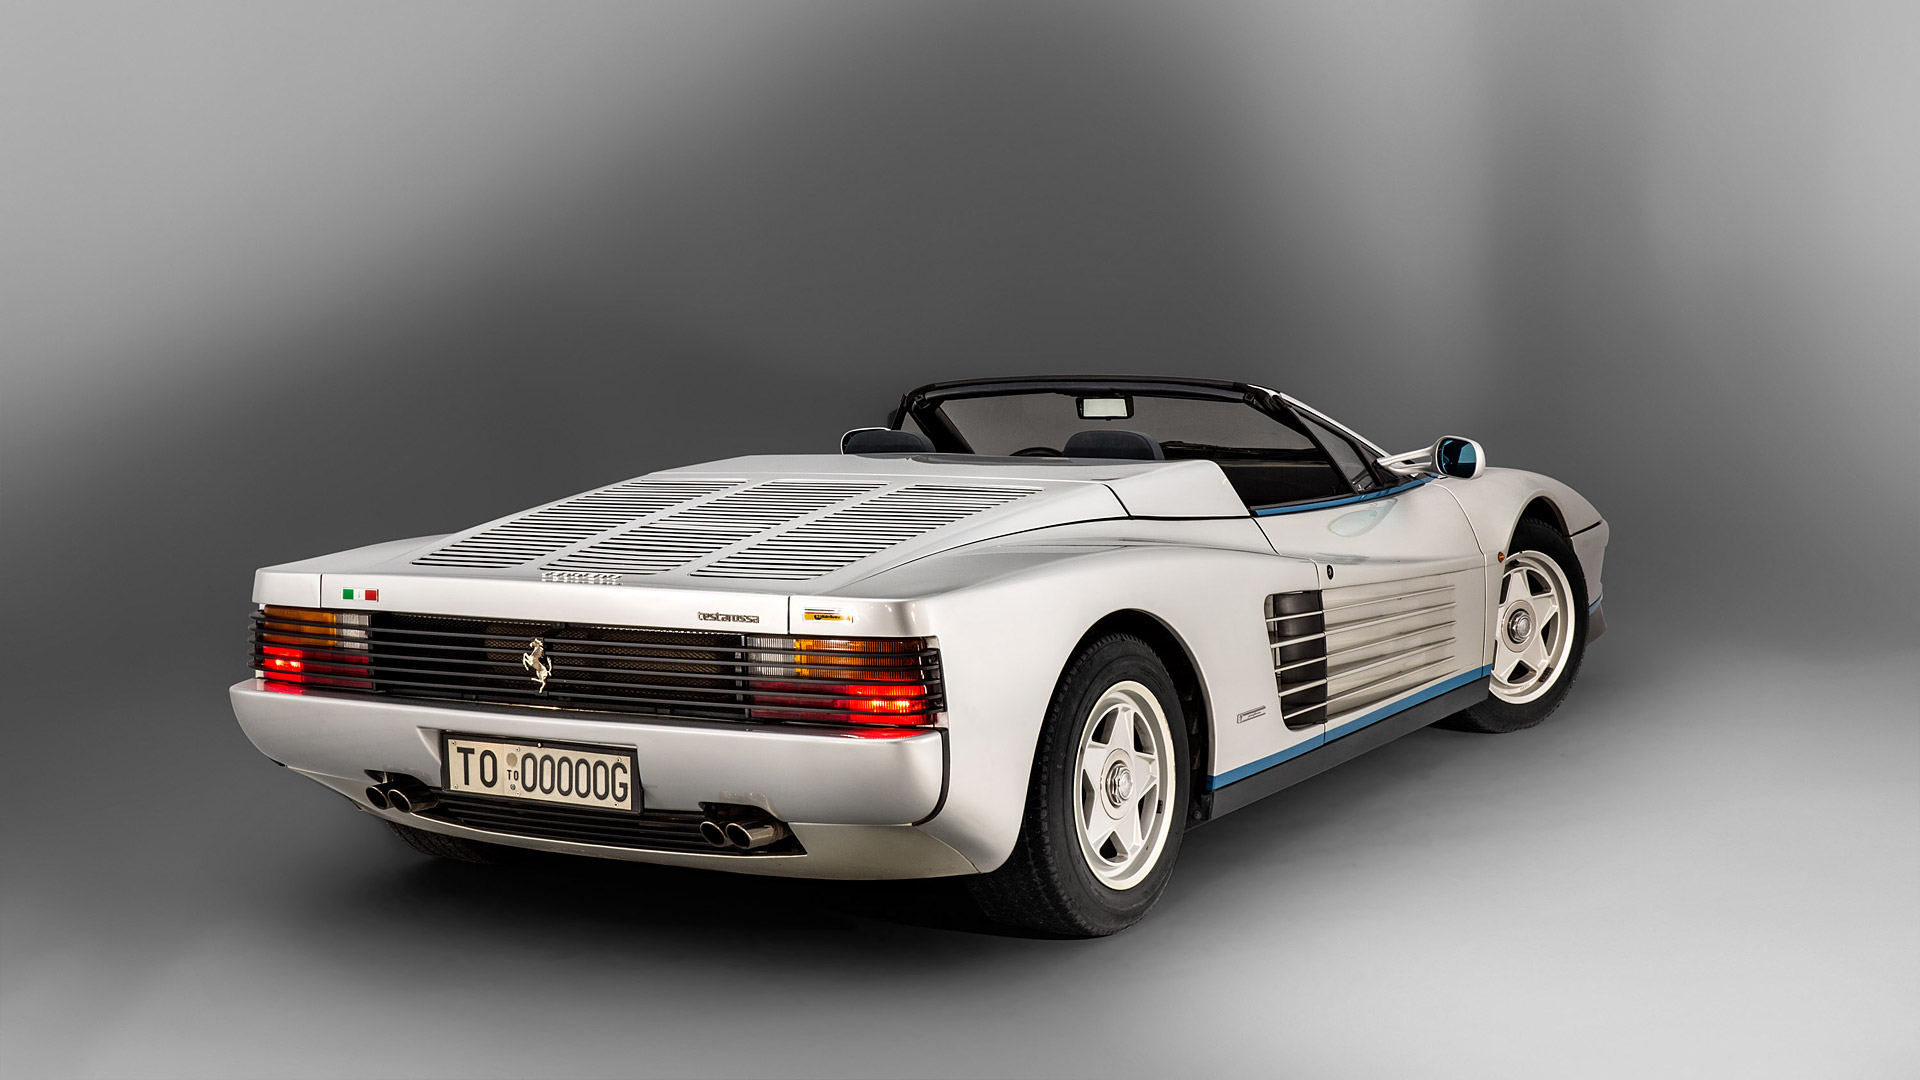 1986 Ferrari Testarossa Spider